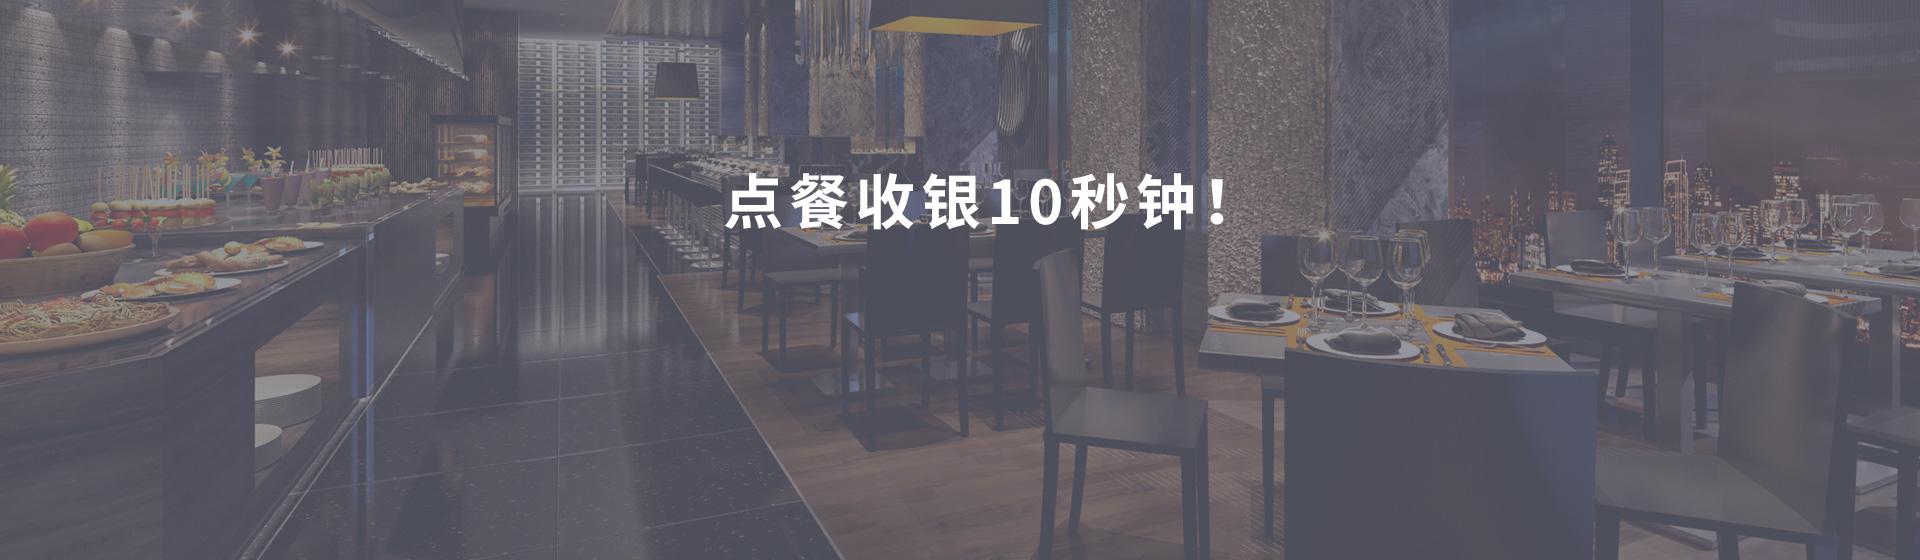 qy_banner1